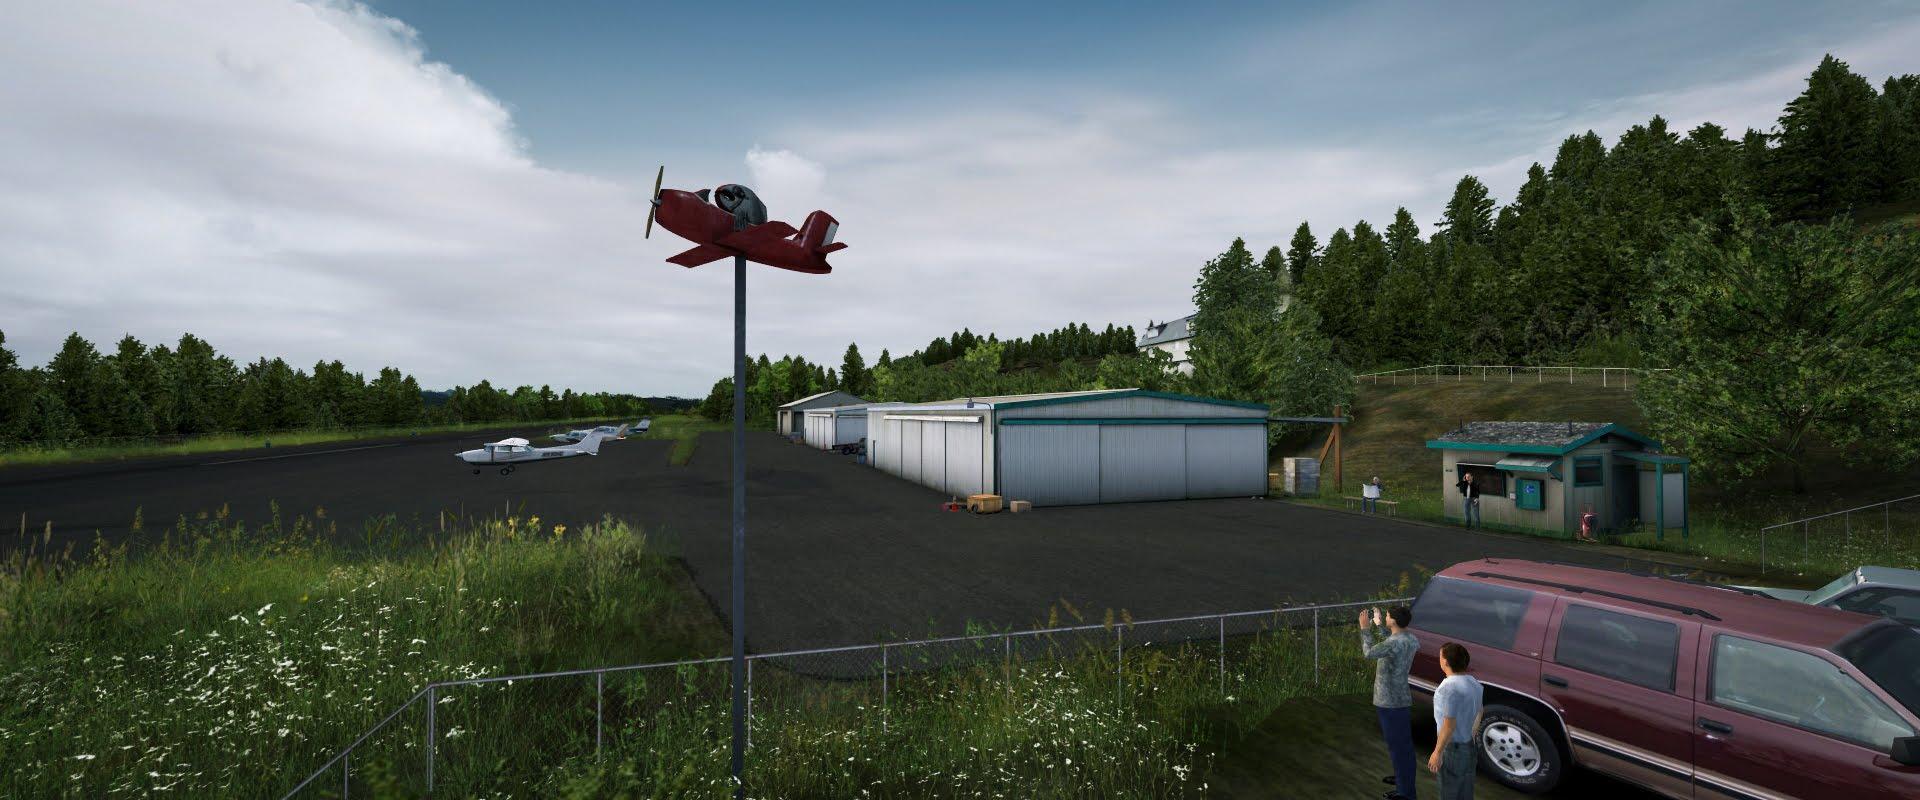 11S Sekiu - ORBX - review (5*) • C-Aviation